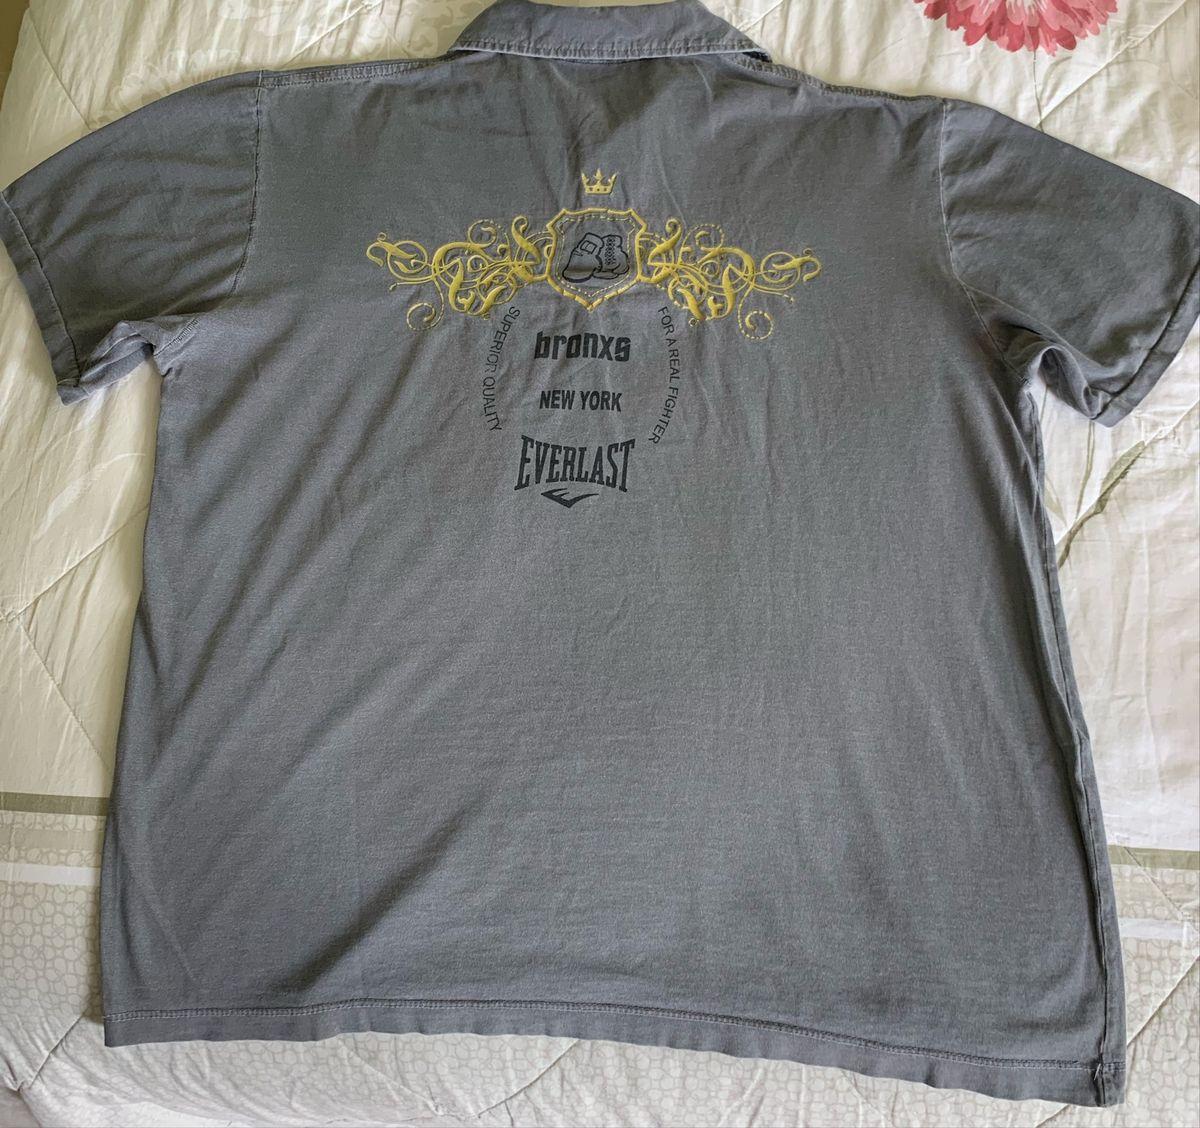 eab04acff9 camisa gola polo everlast - camisetas everlast.  Czm6ly9wag90b3muzw5qb2vplmnvbs5ici9wcm9kdwn0cy82nduznzi1l2nmnmjjmtewnzy1nzc0ndu3nzi2ntmynzbknmflzte4lmpwzw  ...